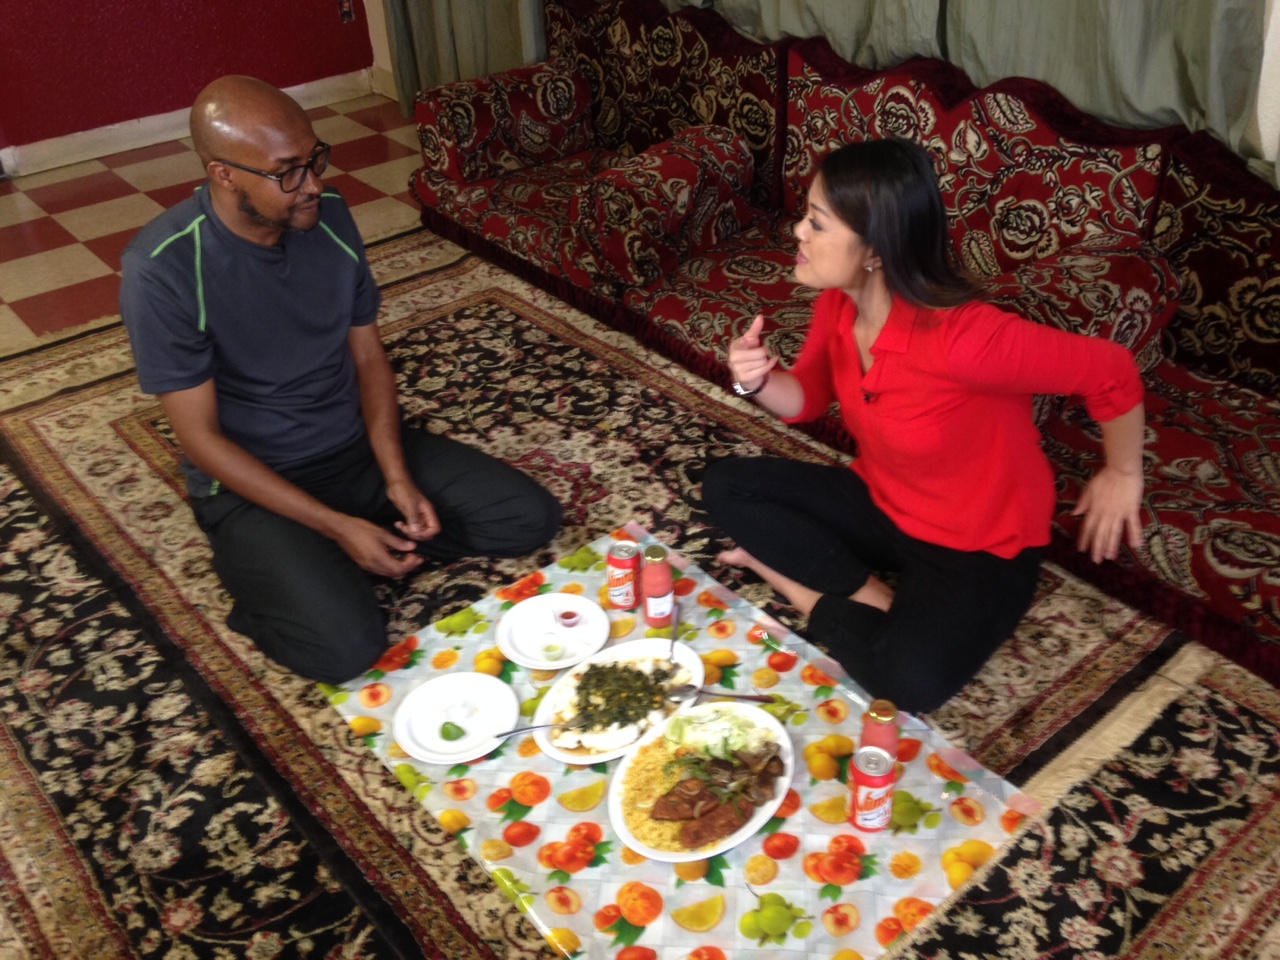 Pin on Amazing Food and recipes |Somali Wedding Food